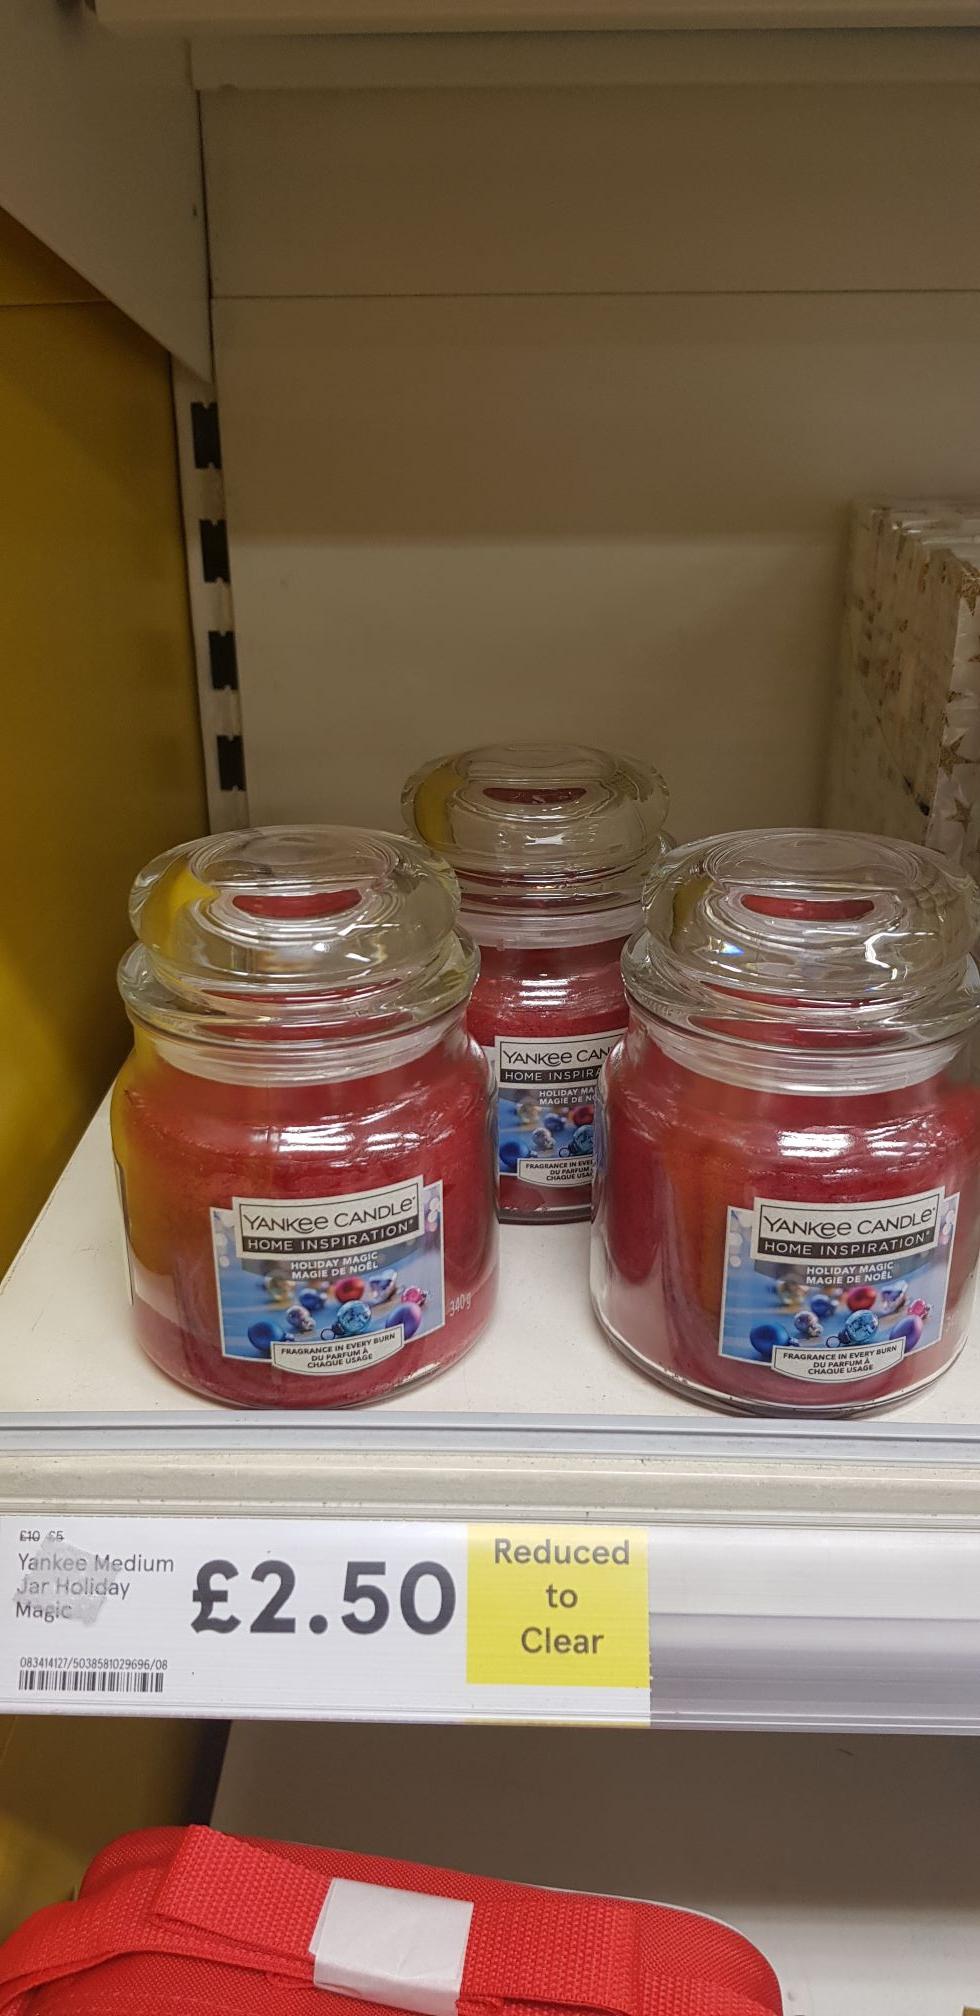 Yankee Medium Jar Holiday Magic £2.50 at Tesco (In Store)